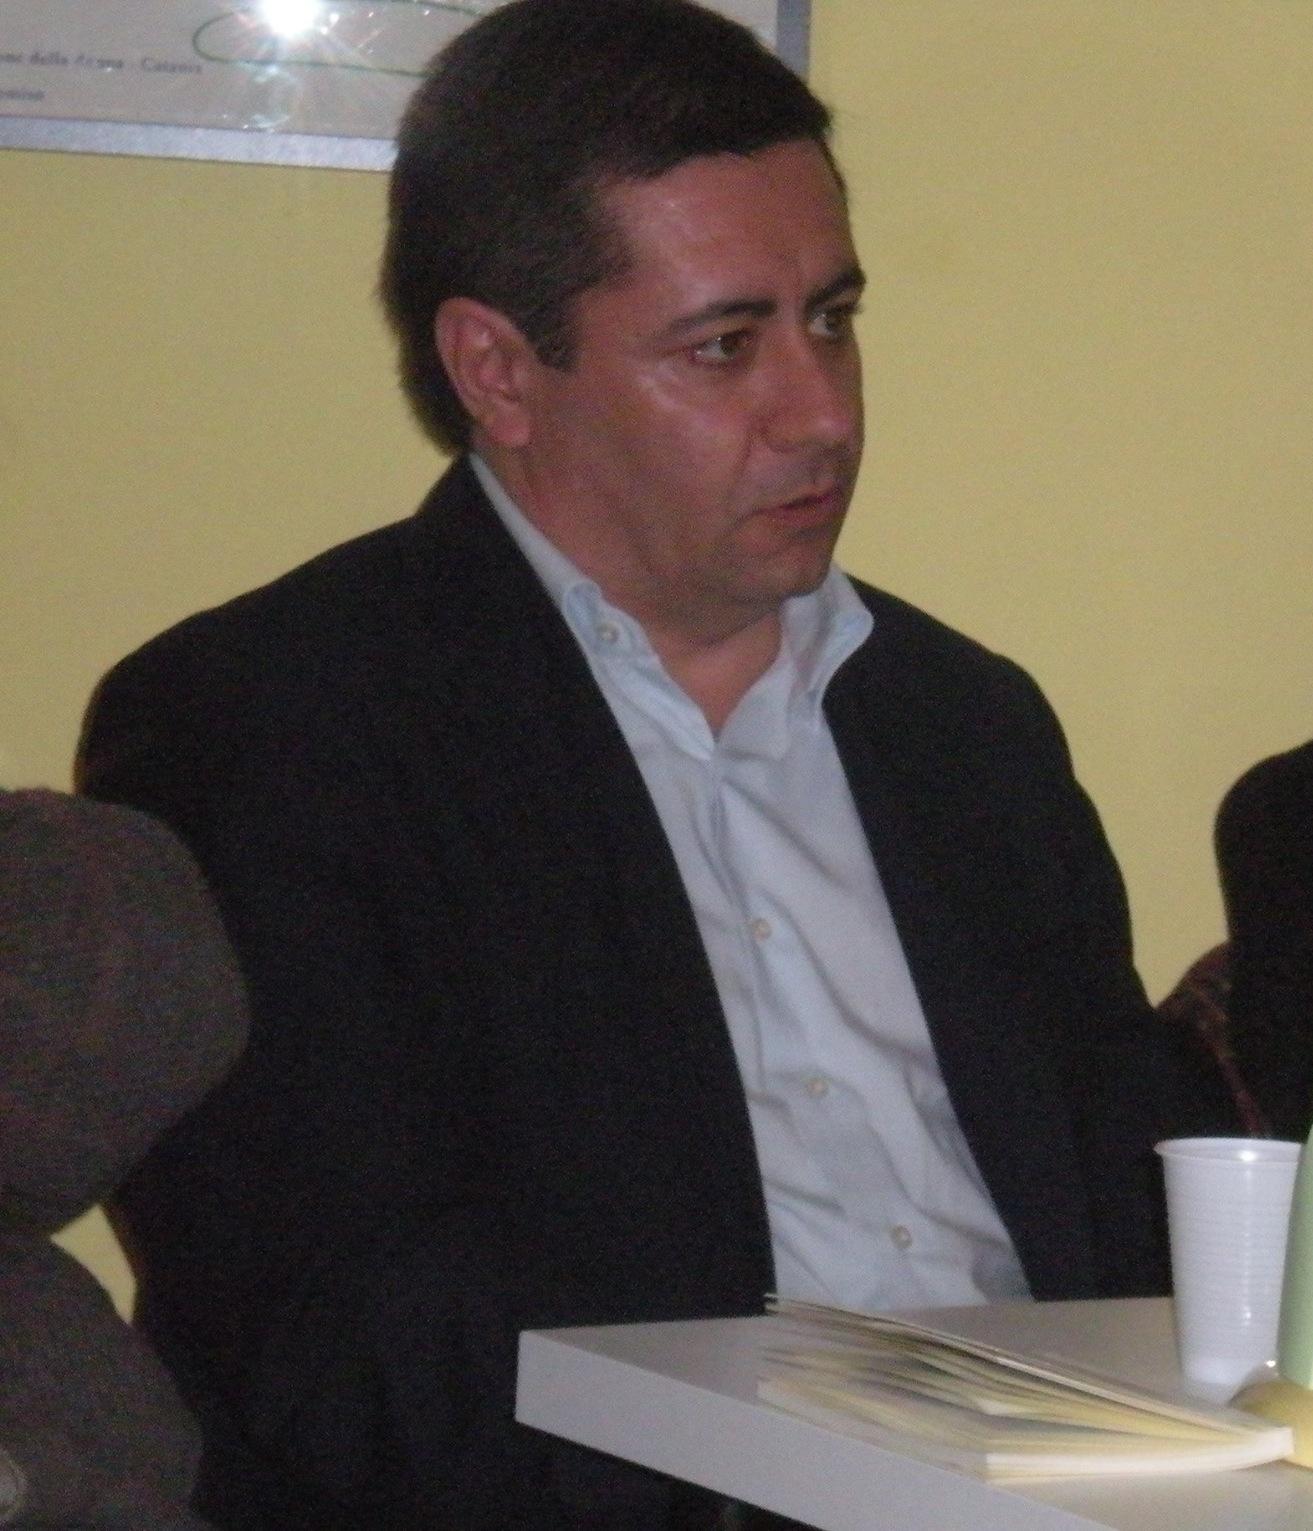 prof. Dario Stazzone